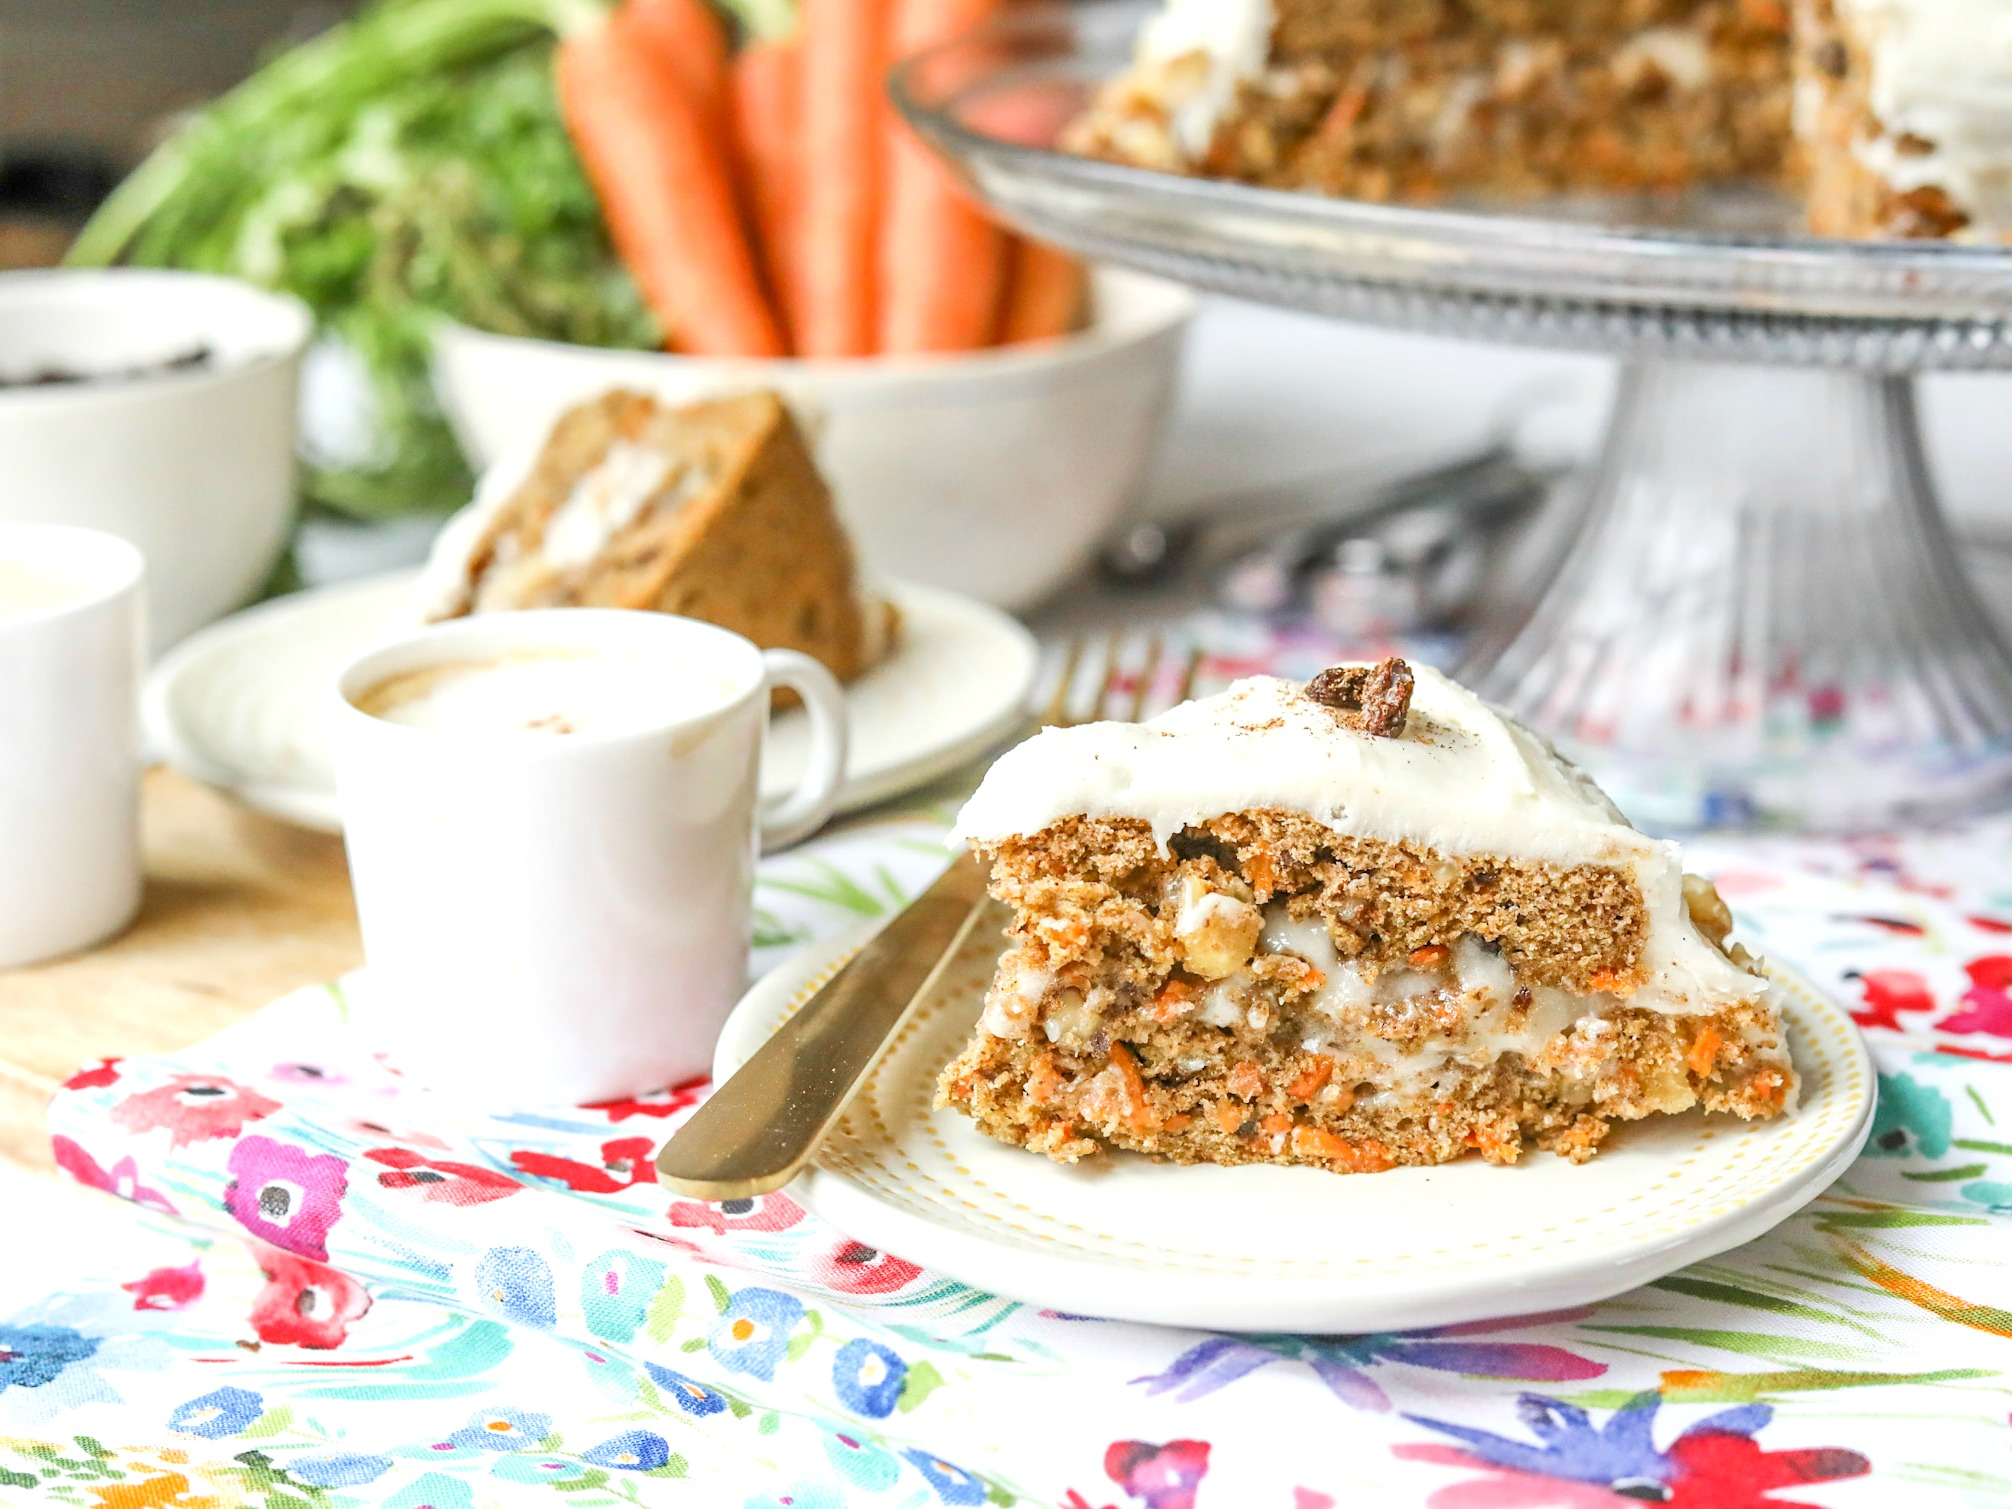 The Best Vegan Carrot Cake (Gluten Free & No Sugar)